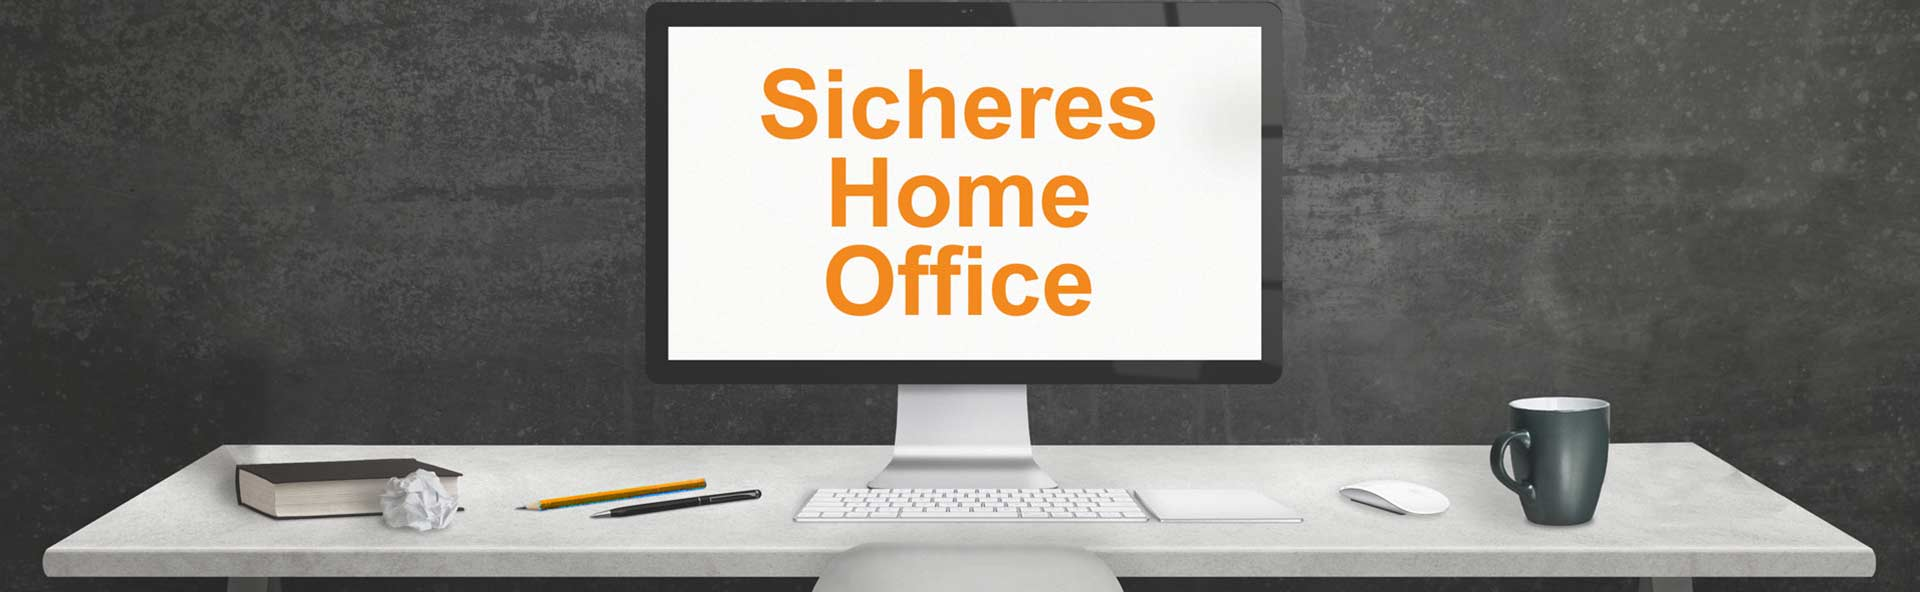 Sicheres-Home-Office-Mannheim